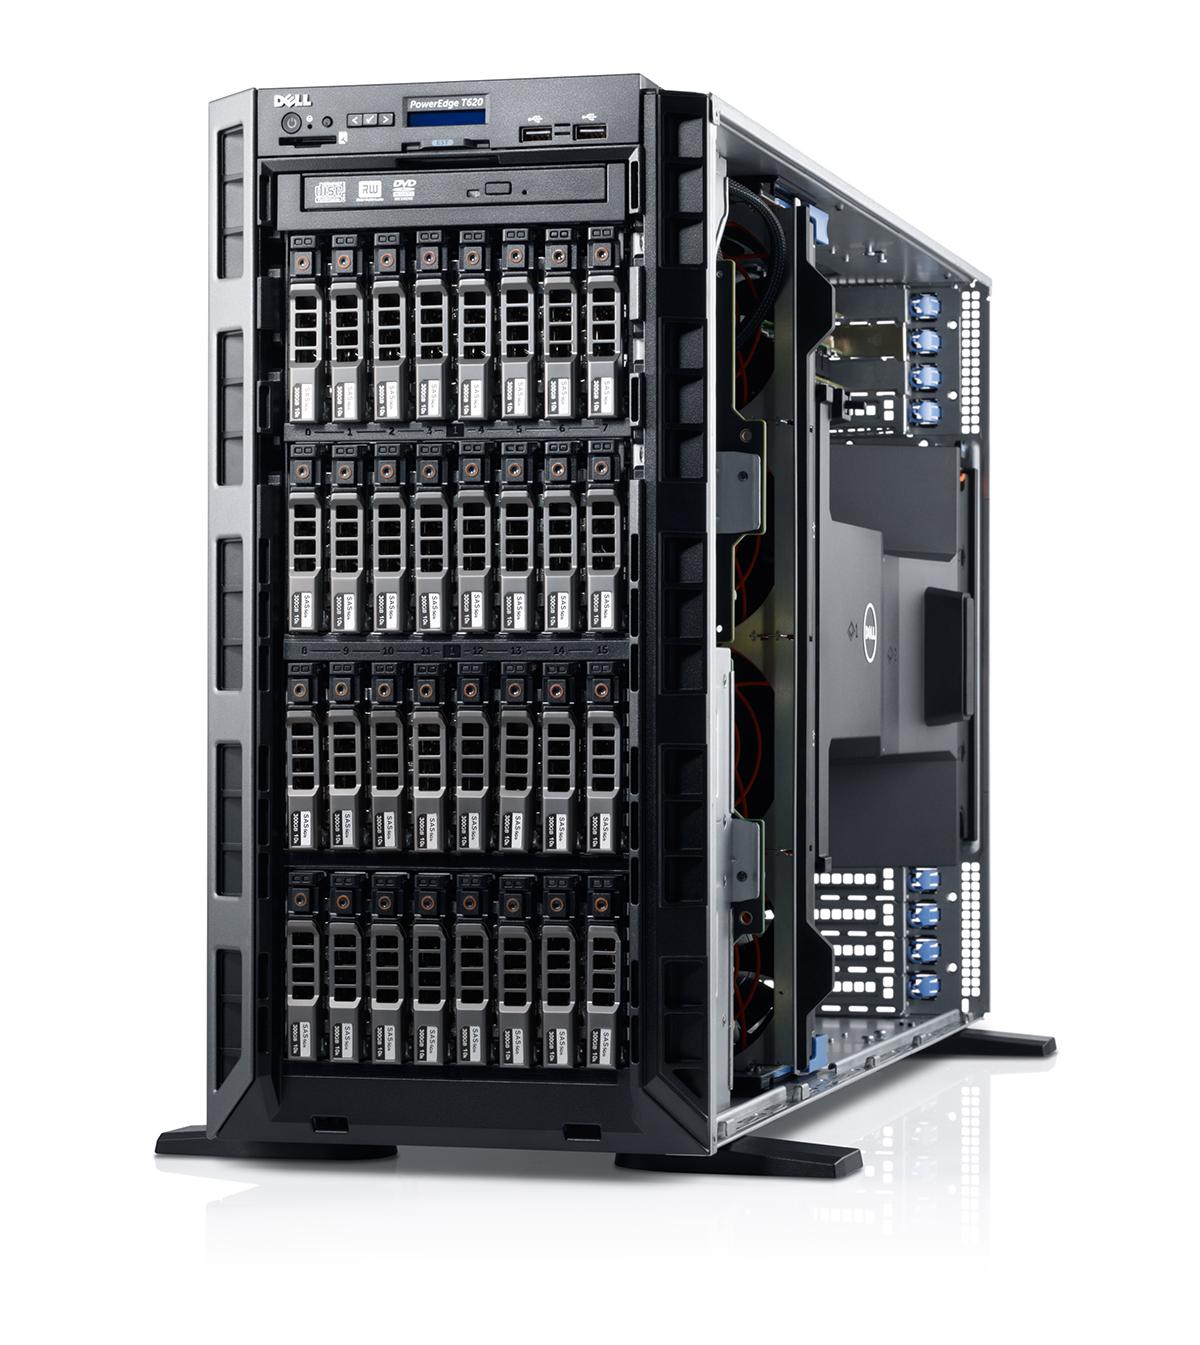 Dell PowerEdge T630 E5-2609 v4, 8GB, non-HDD 18x3.5'' hot plug, DVDRW, H730, 4x1GBE, iDRAC8 Express, 2x750W, 3 Yrs Pro